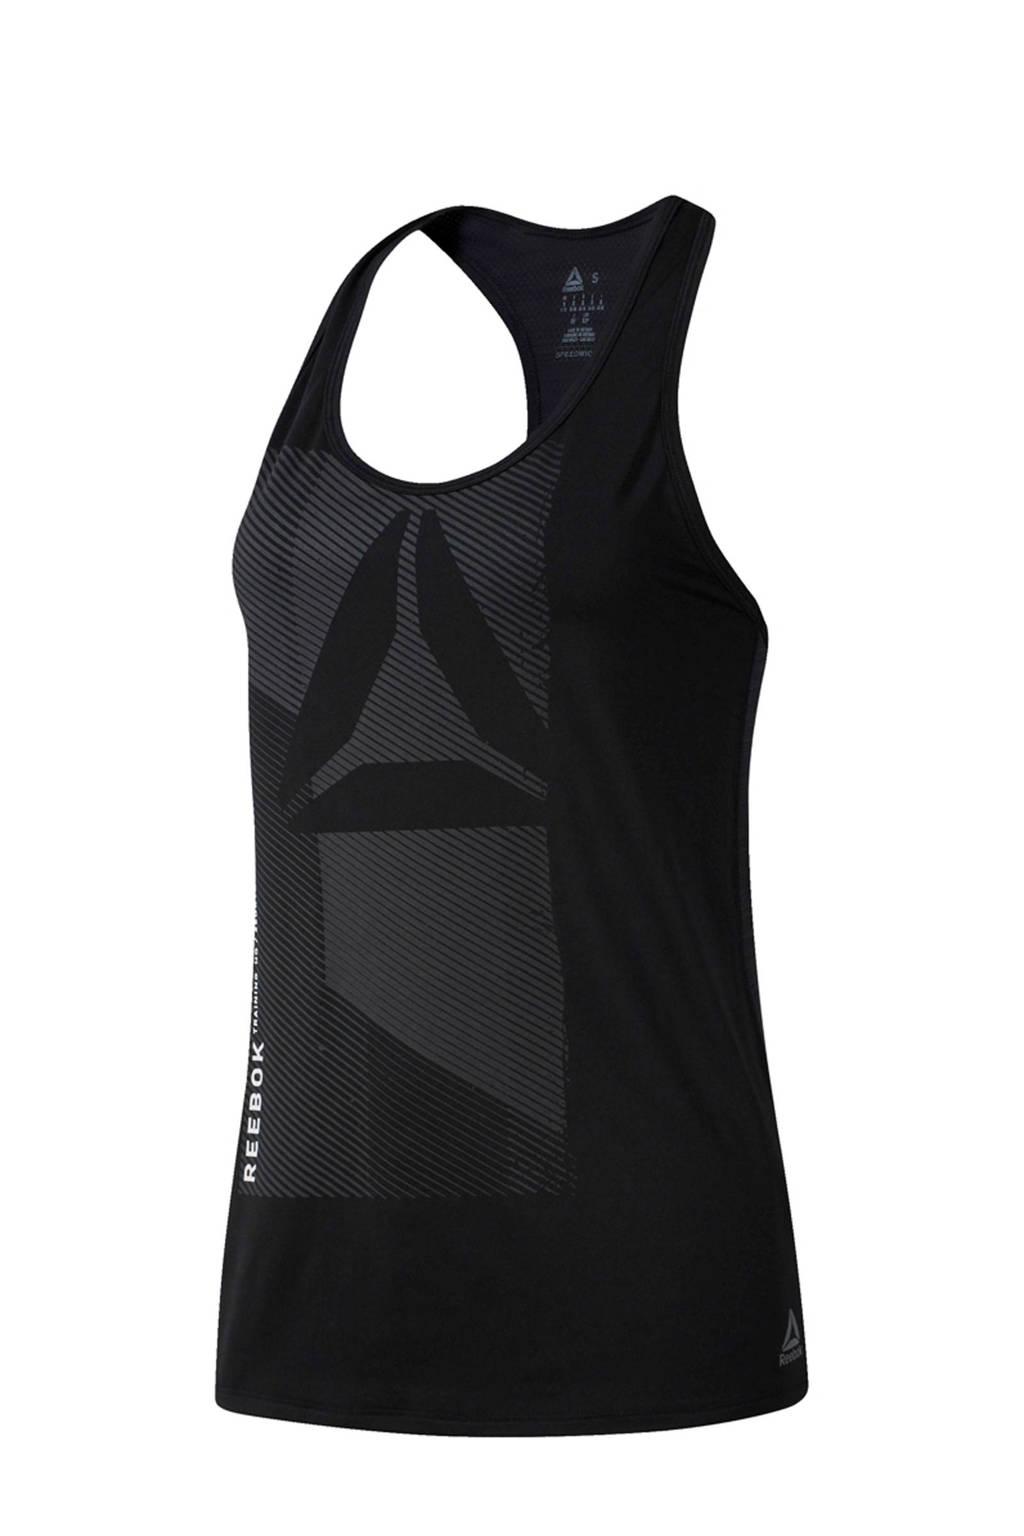 Reebok Training sporttop zwart, Zwart/grijs